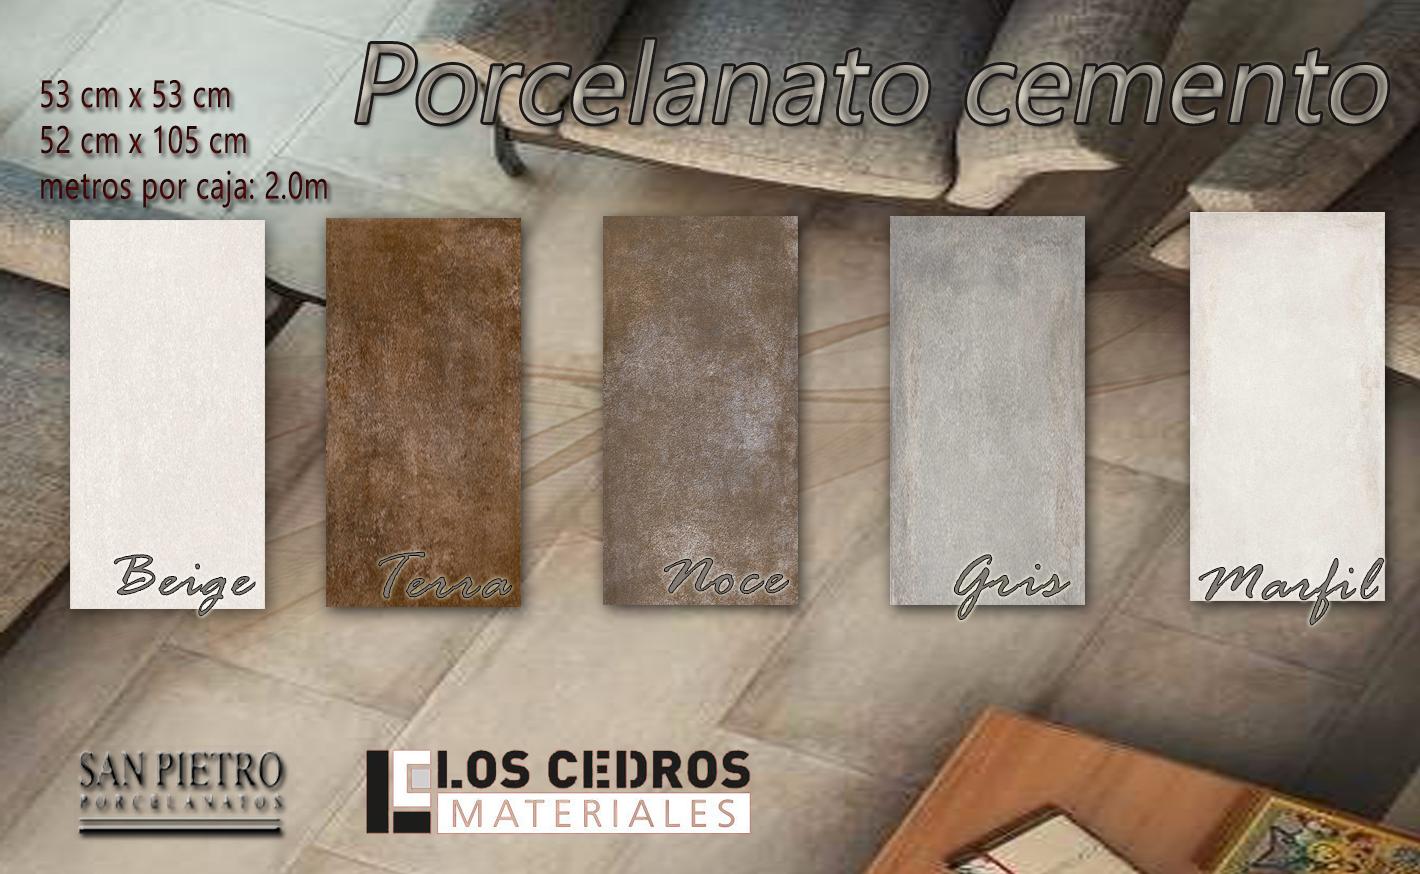 porcelanato cemento